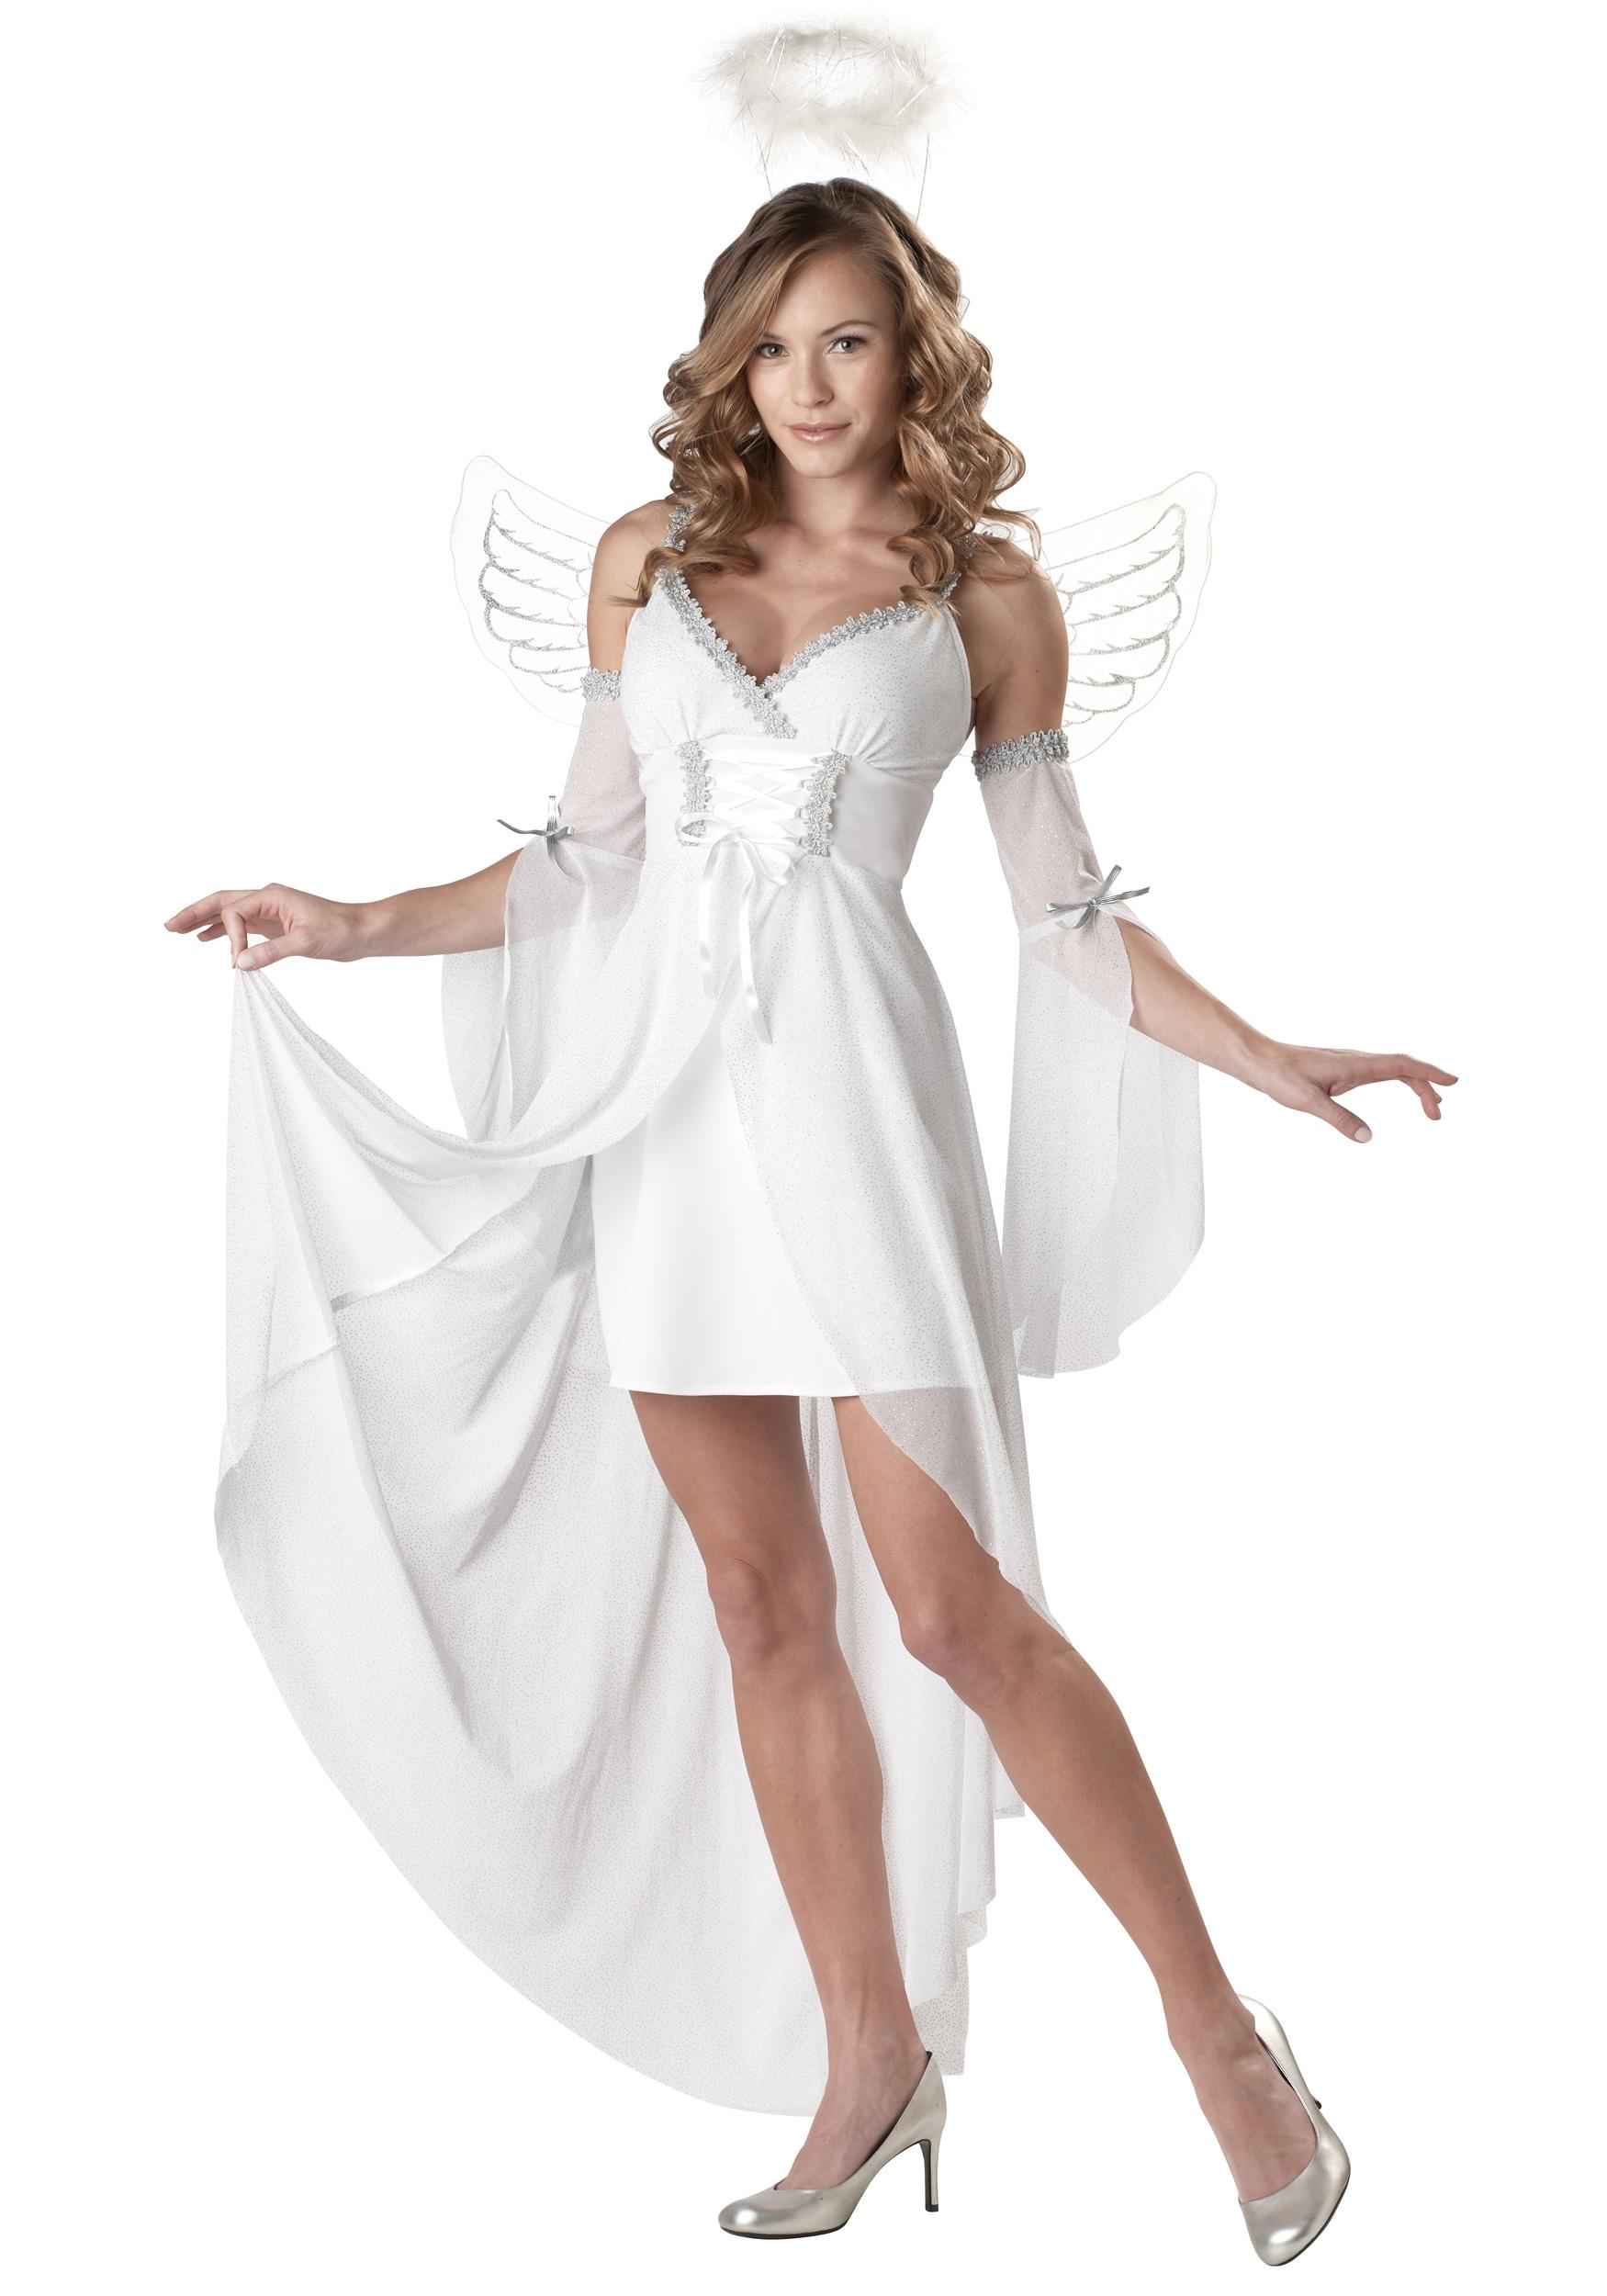 Angel Hot Girls Image Nude Angel Wings Costume High Quality Sexy Angel Costume